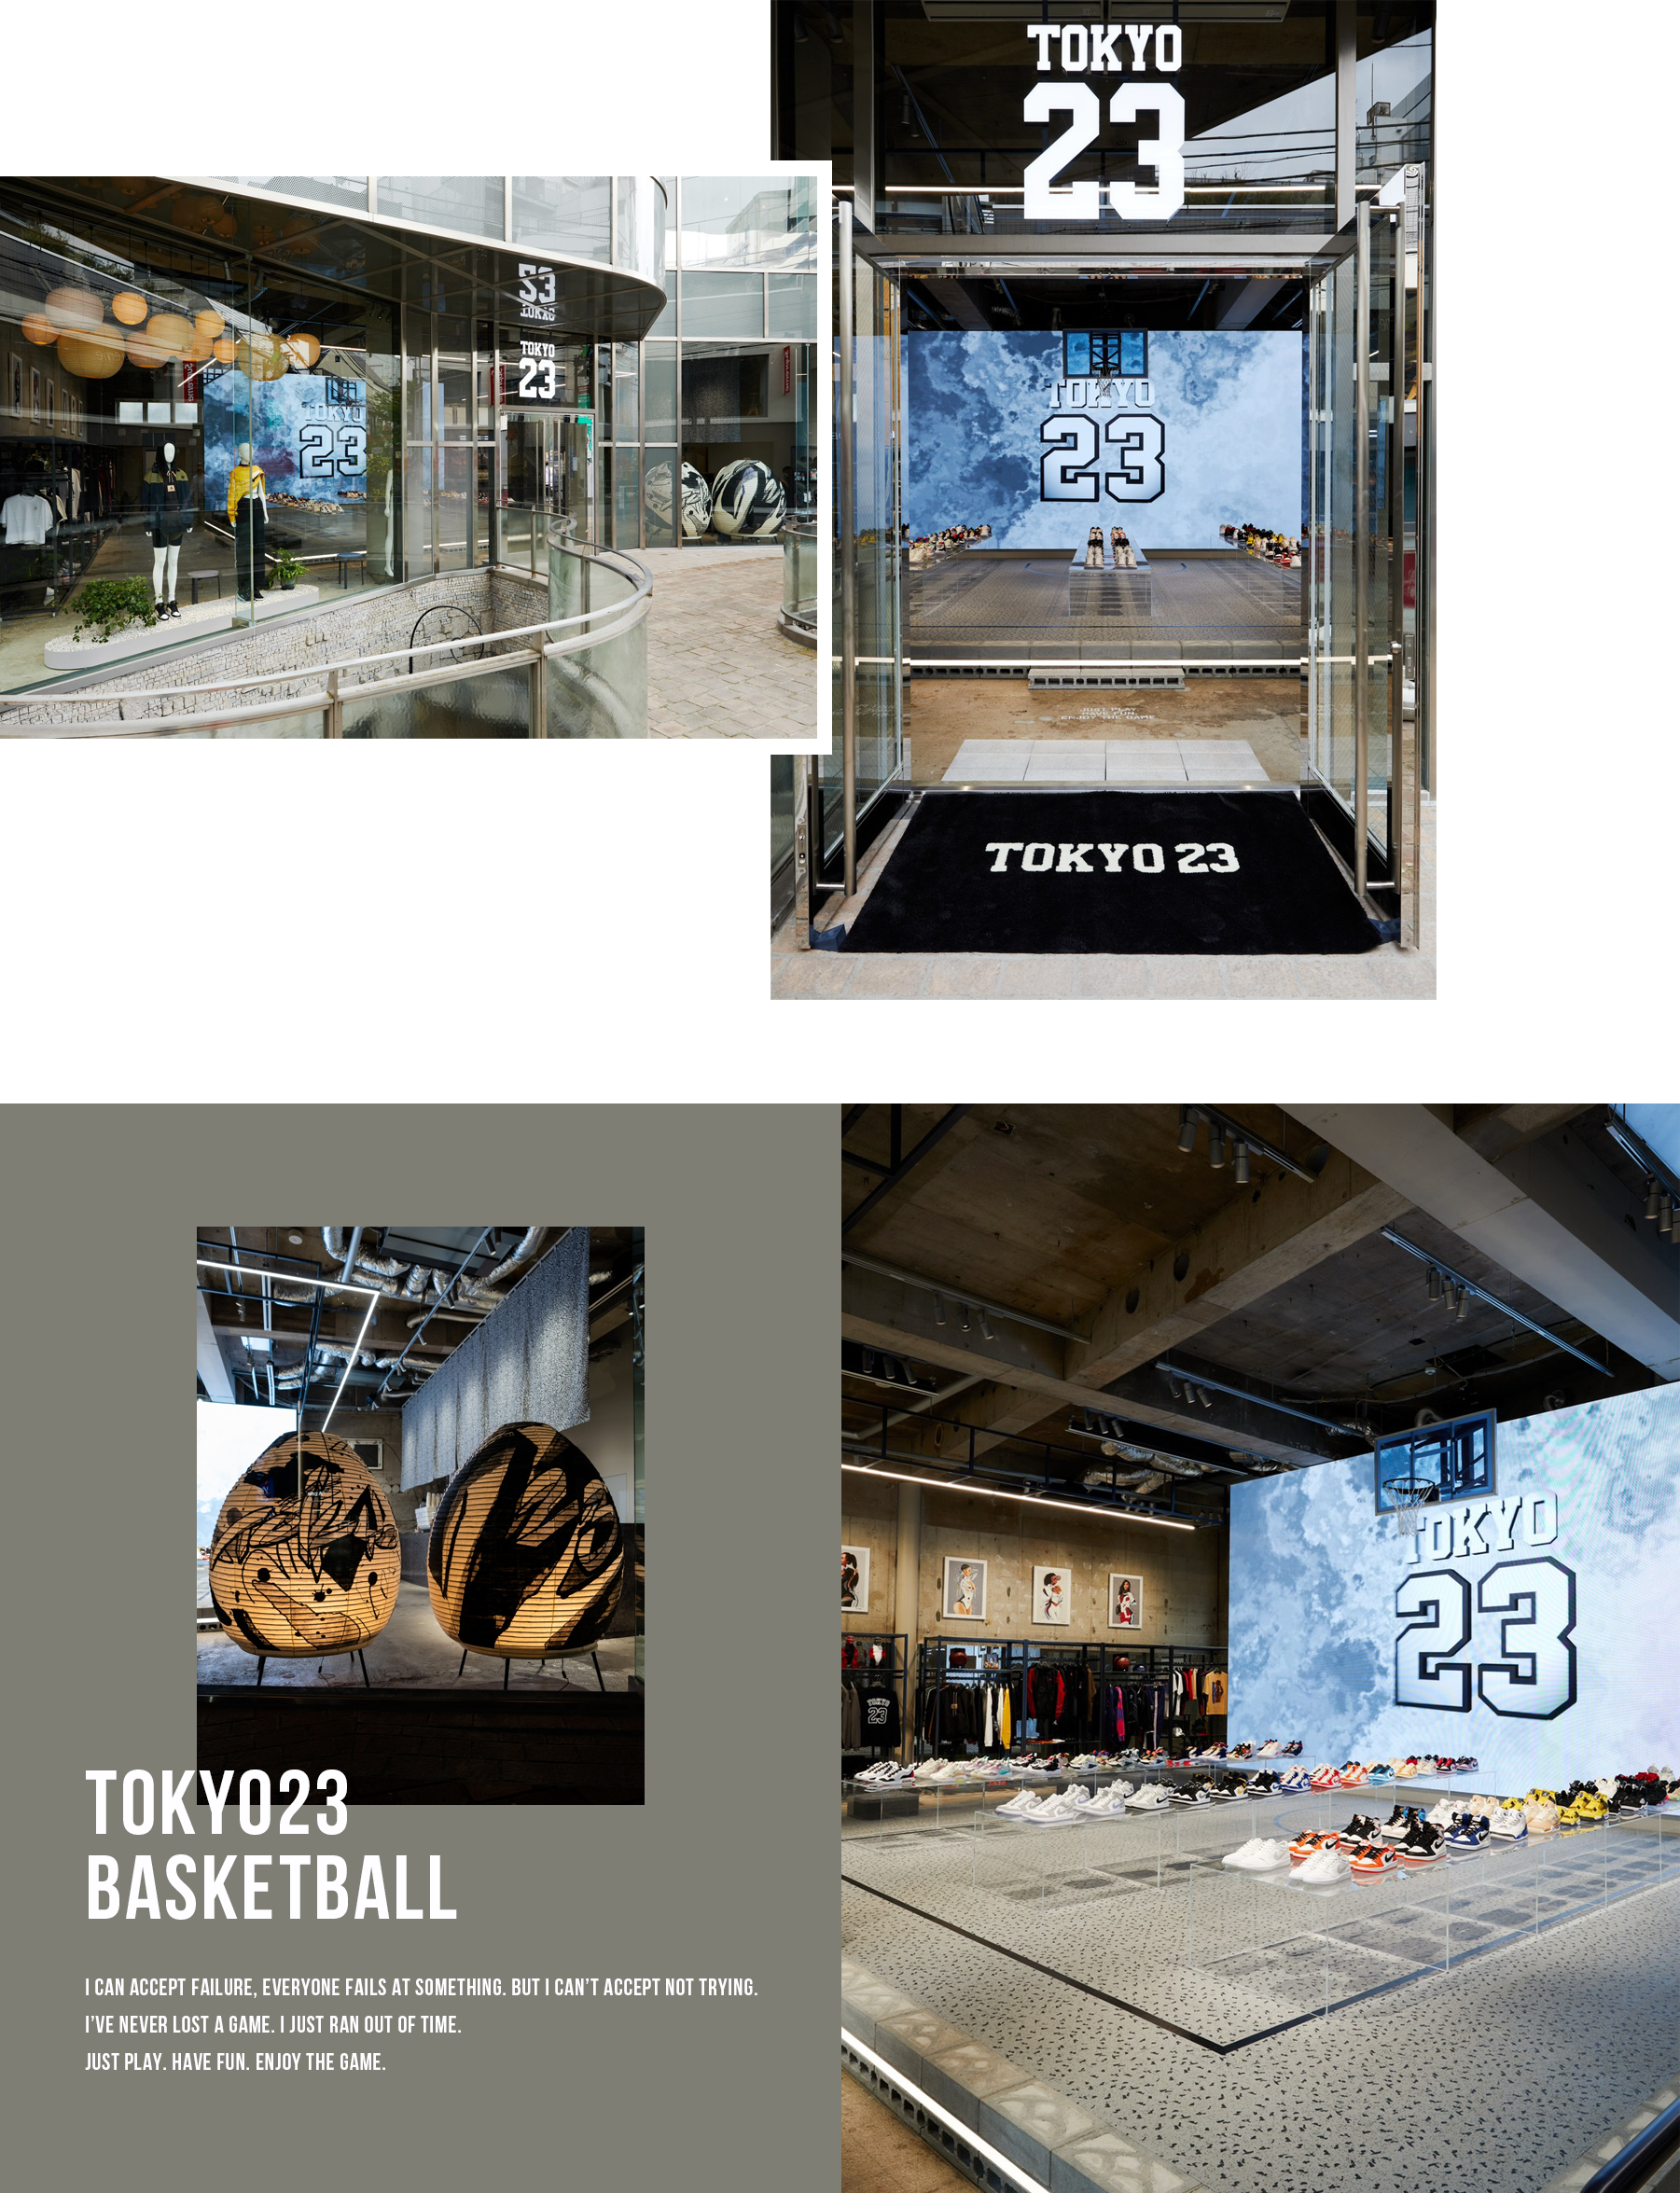 TOKYO 23